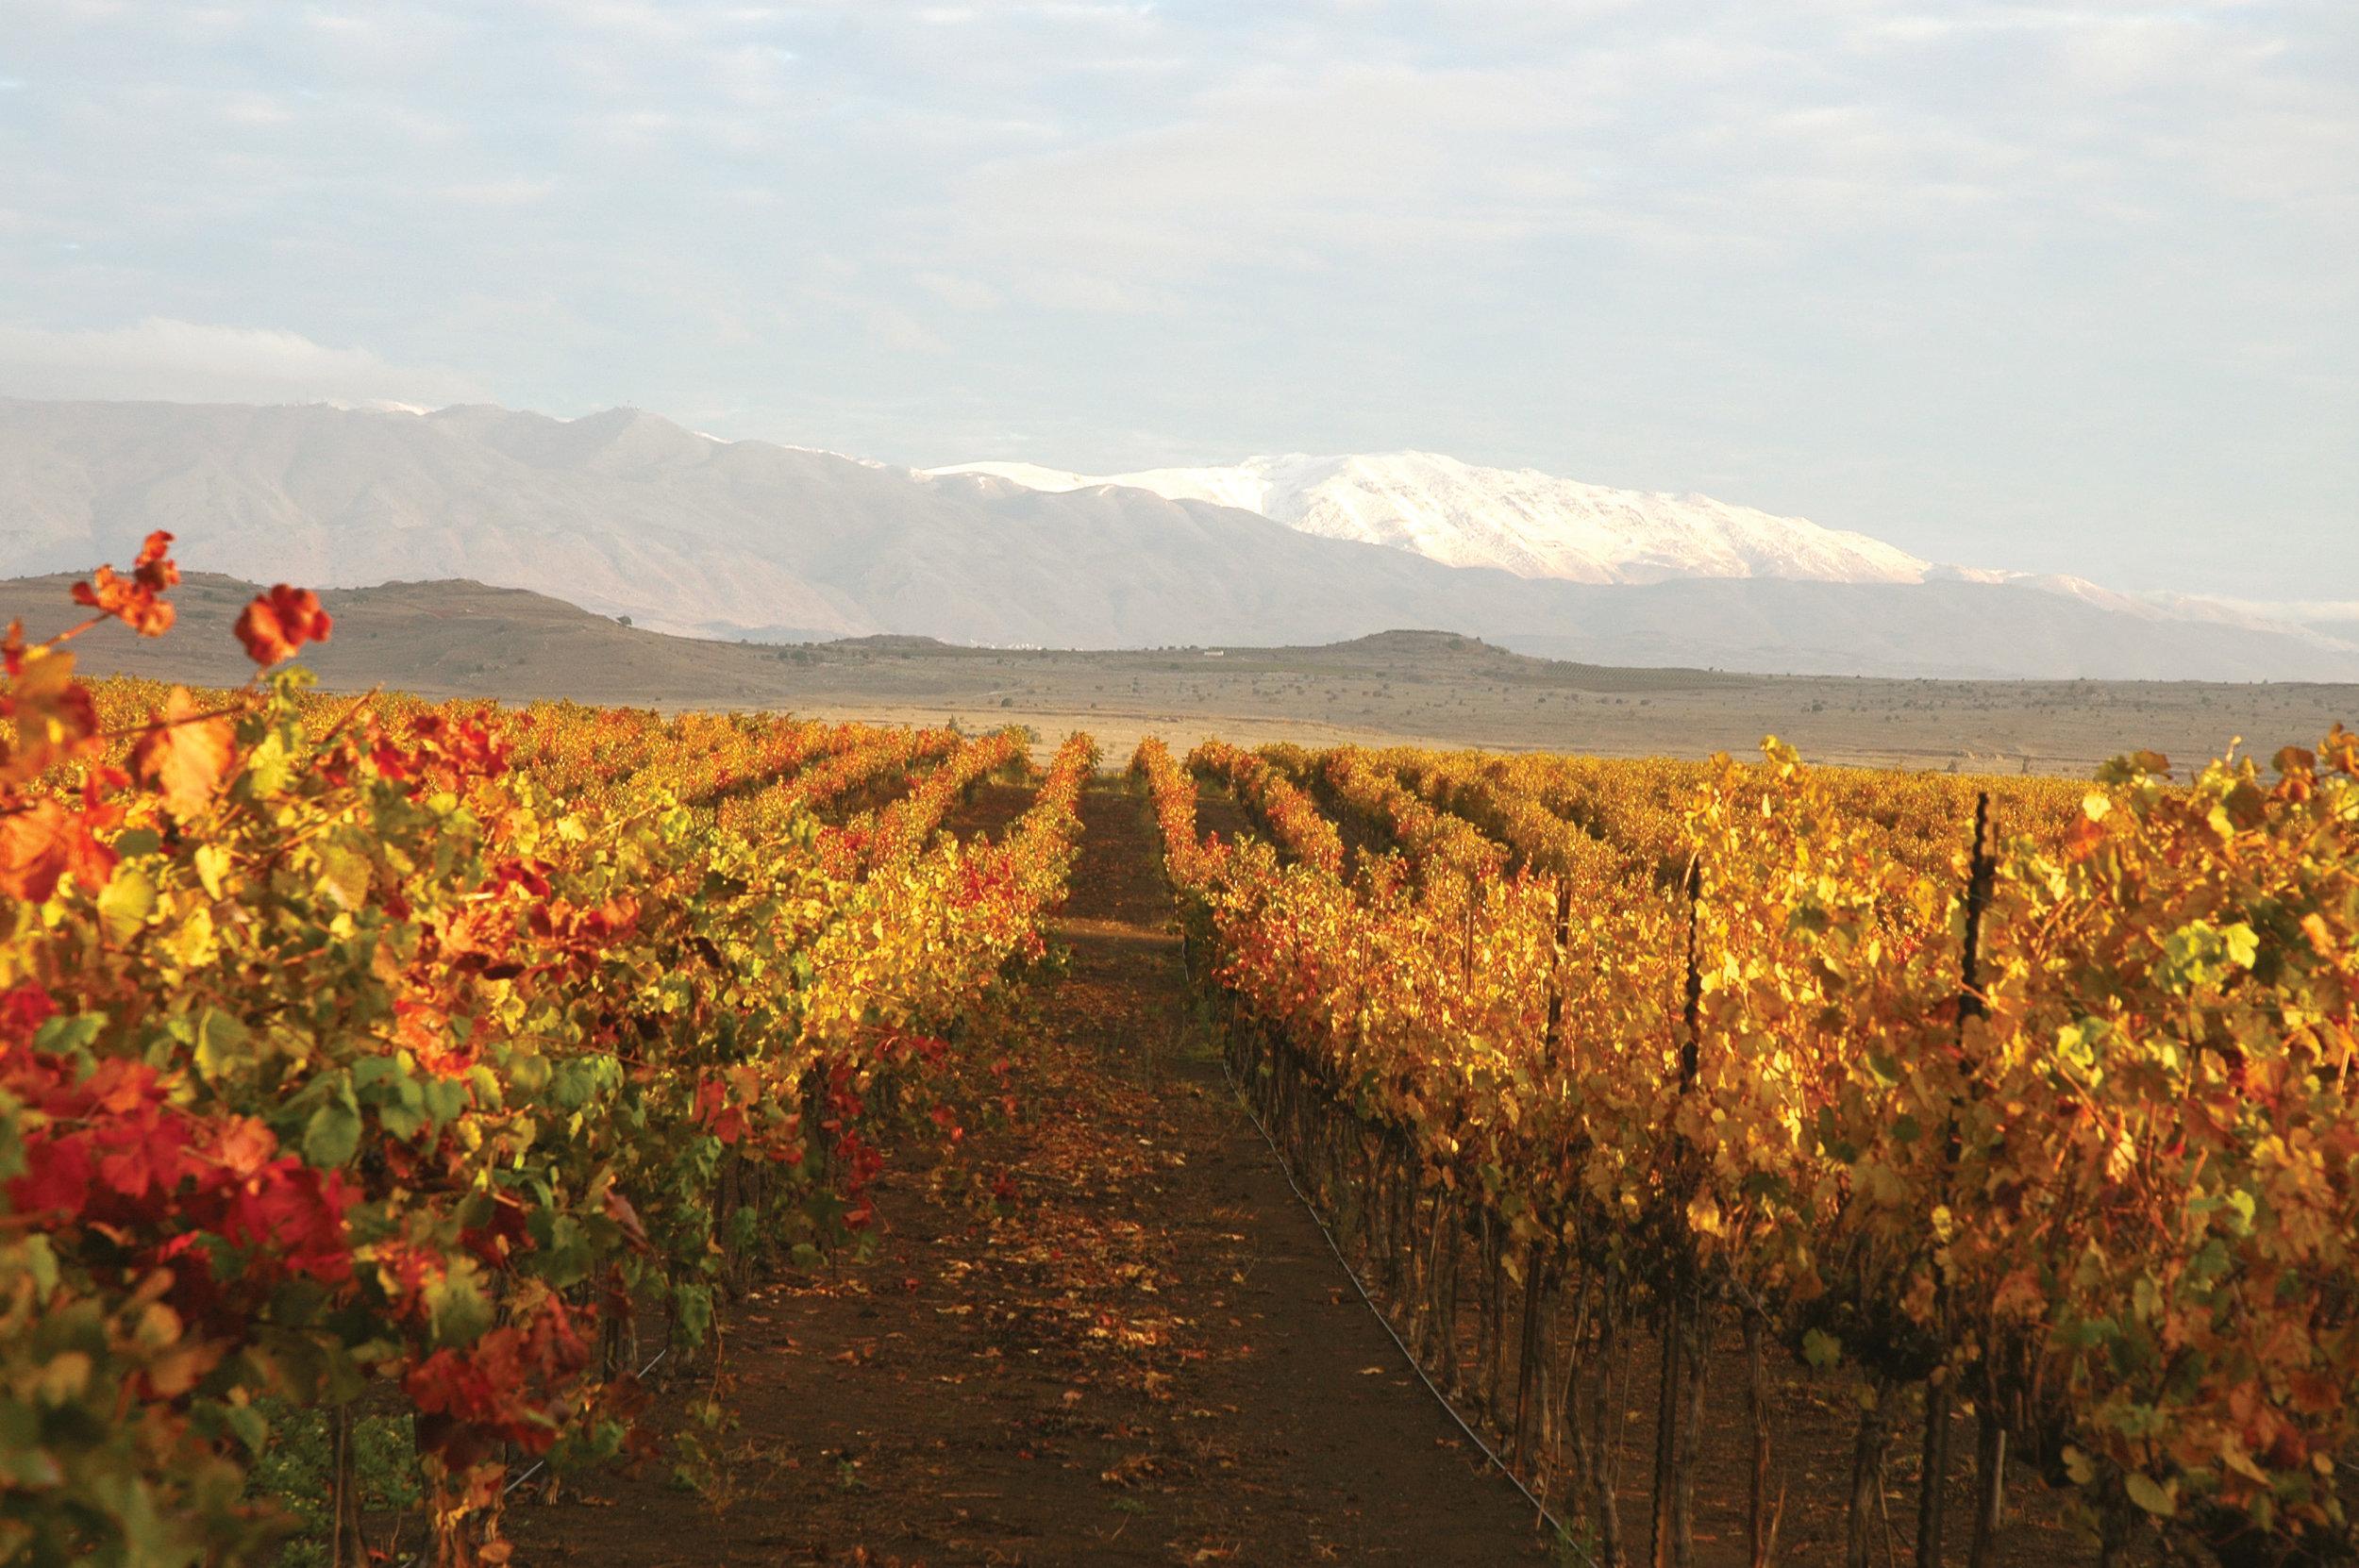 Yarden GHW Odem vineyards-fall 2008.jpg